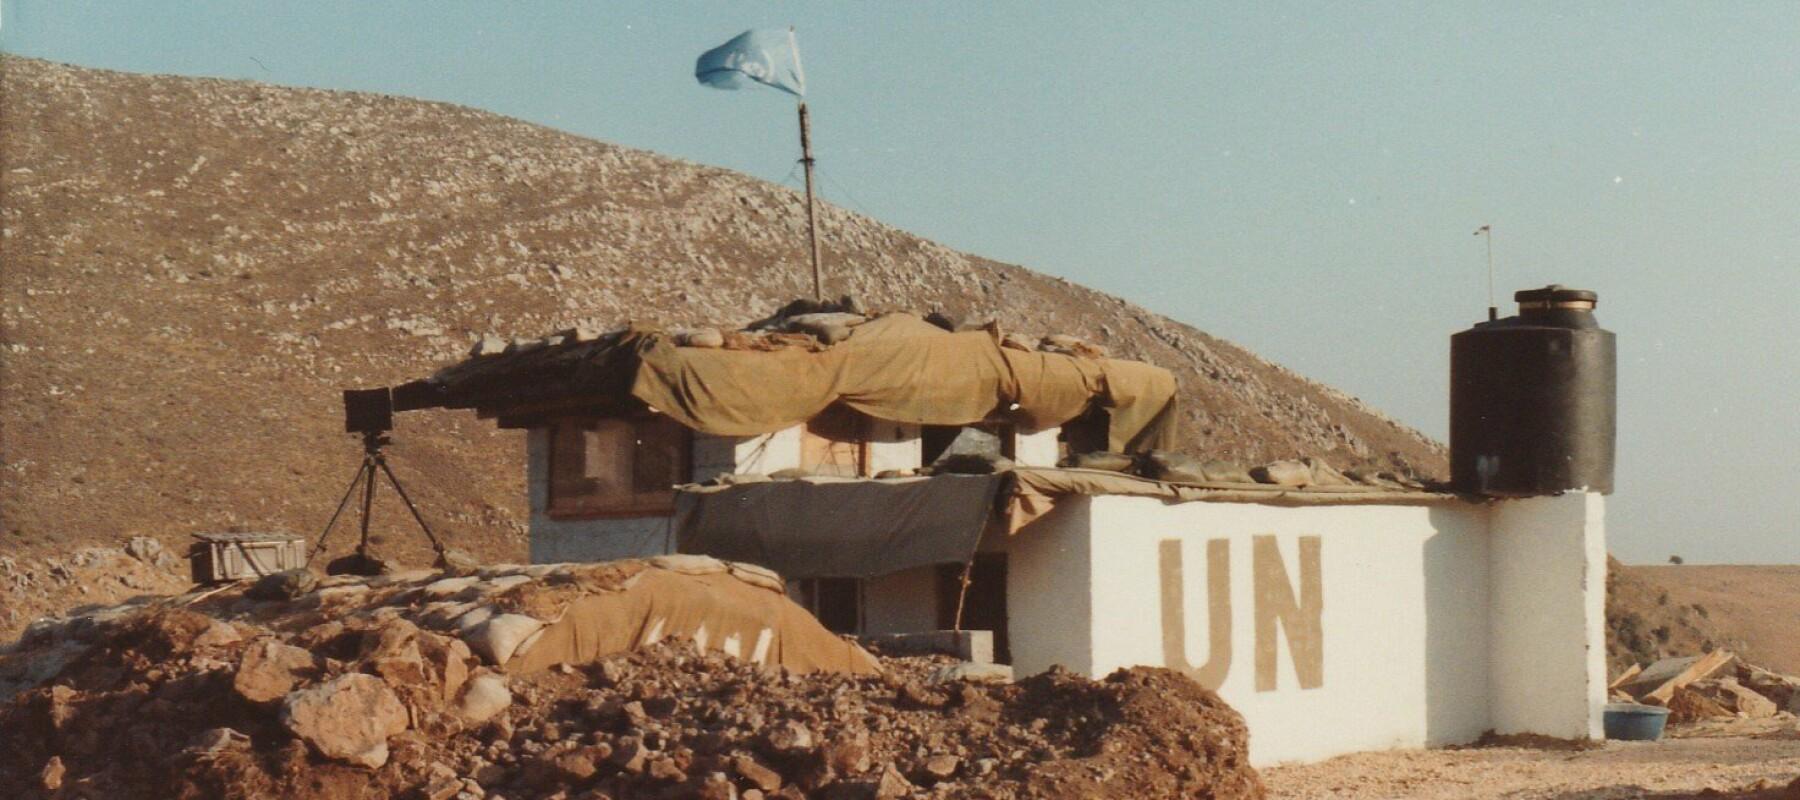 Bilder til og fra boken Norske FN-soldater i skuddlinjen, av Frank Magnes